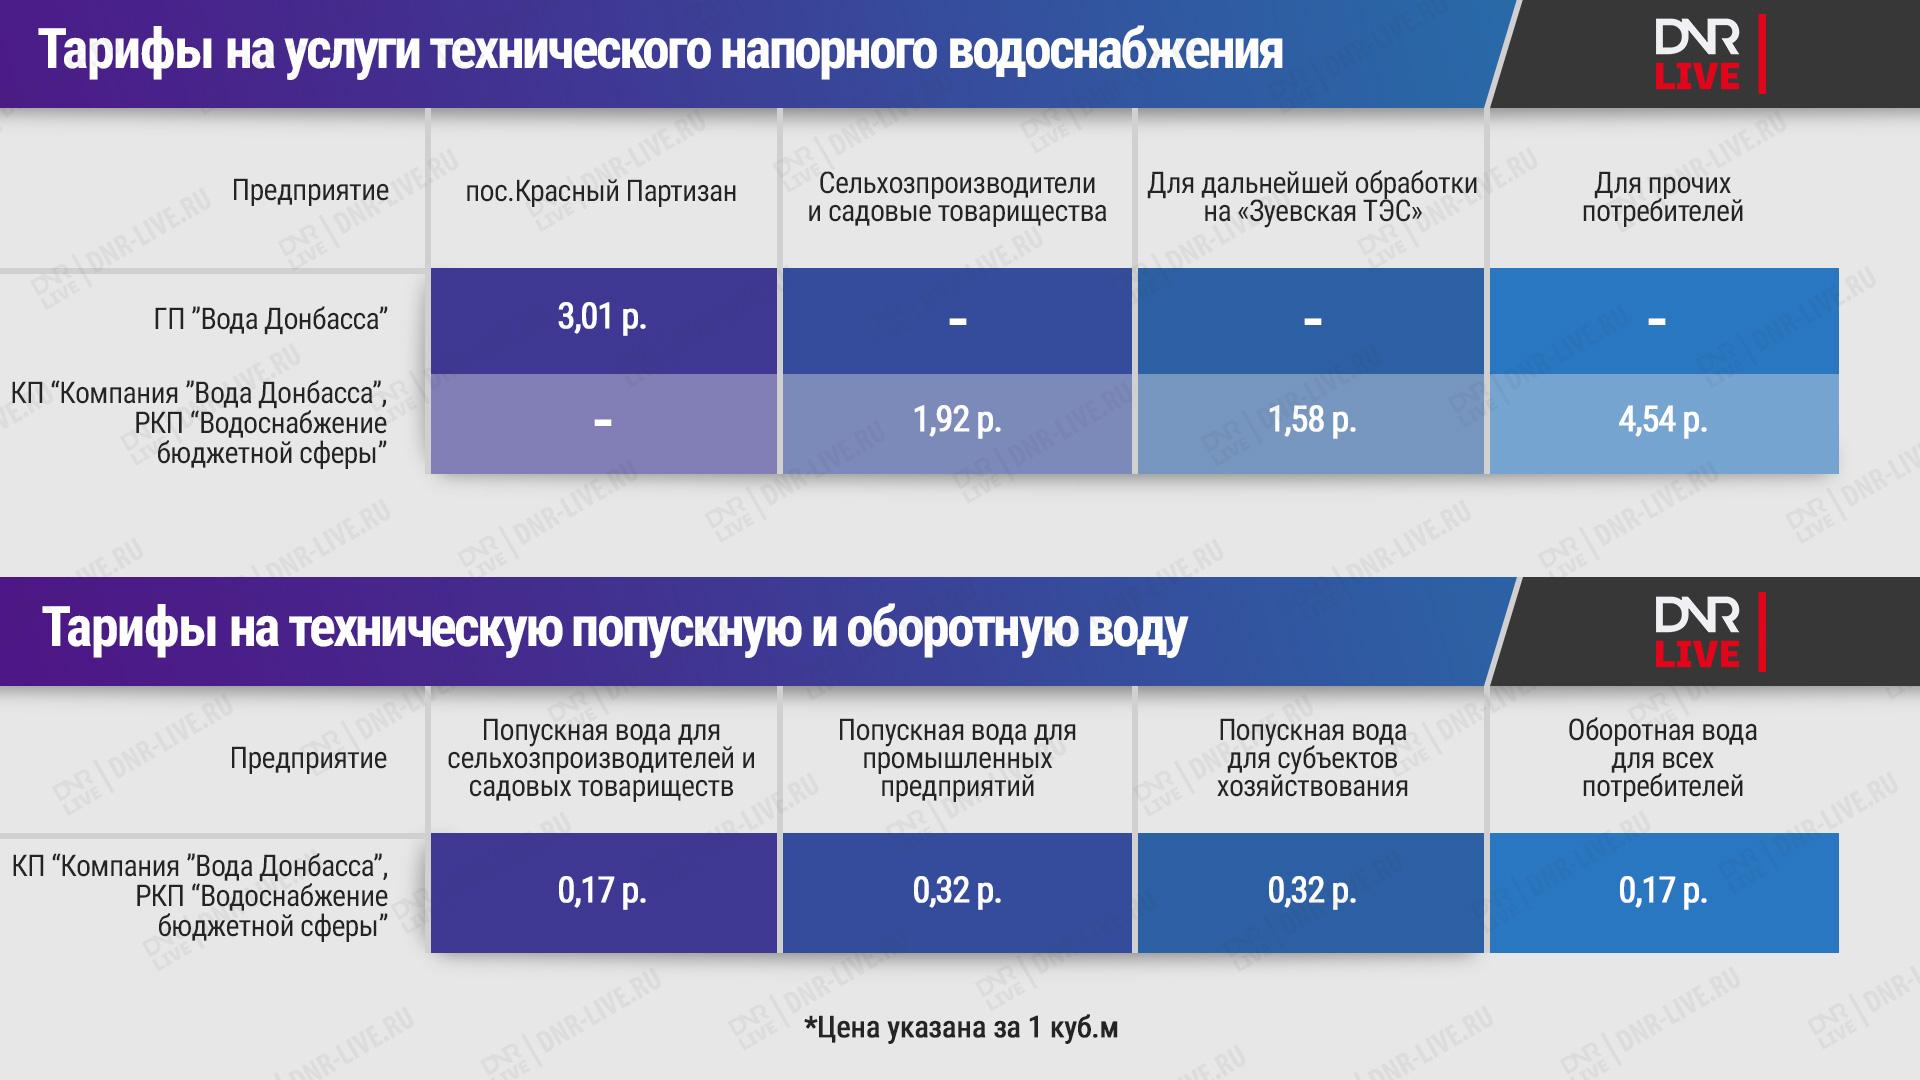 Тарифы_на_услуги_технического_напорного